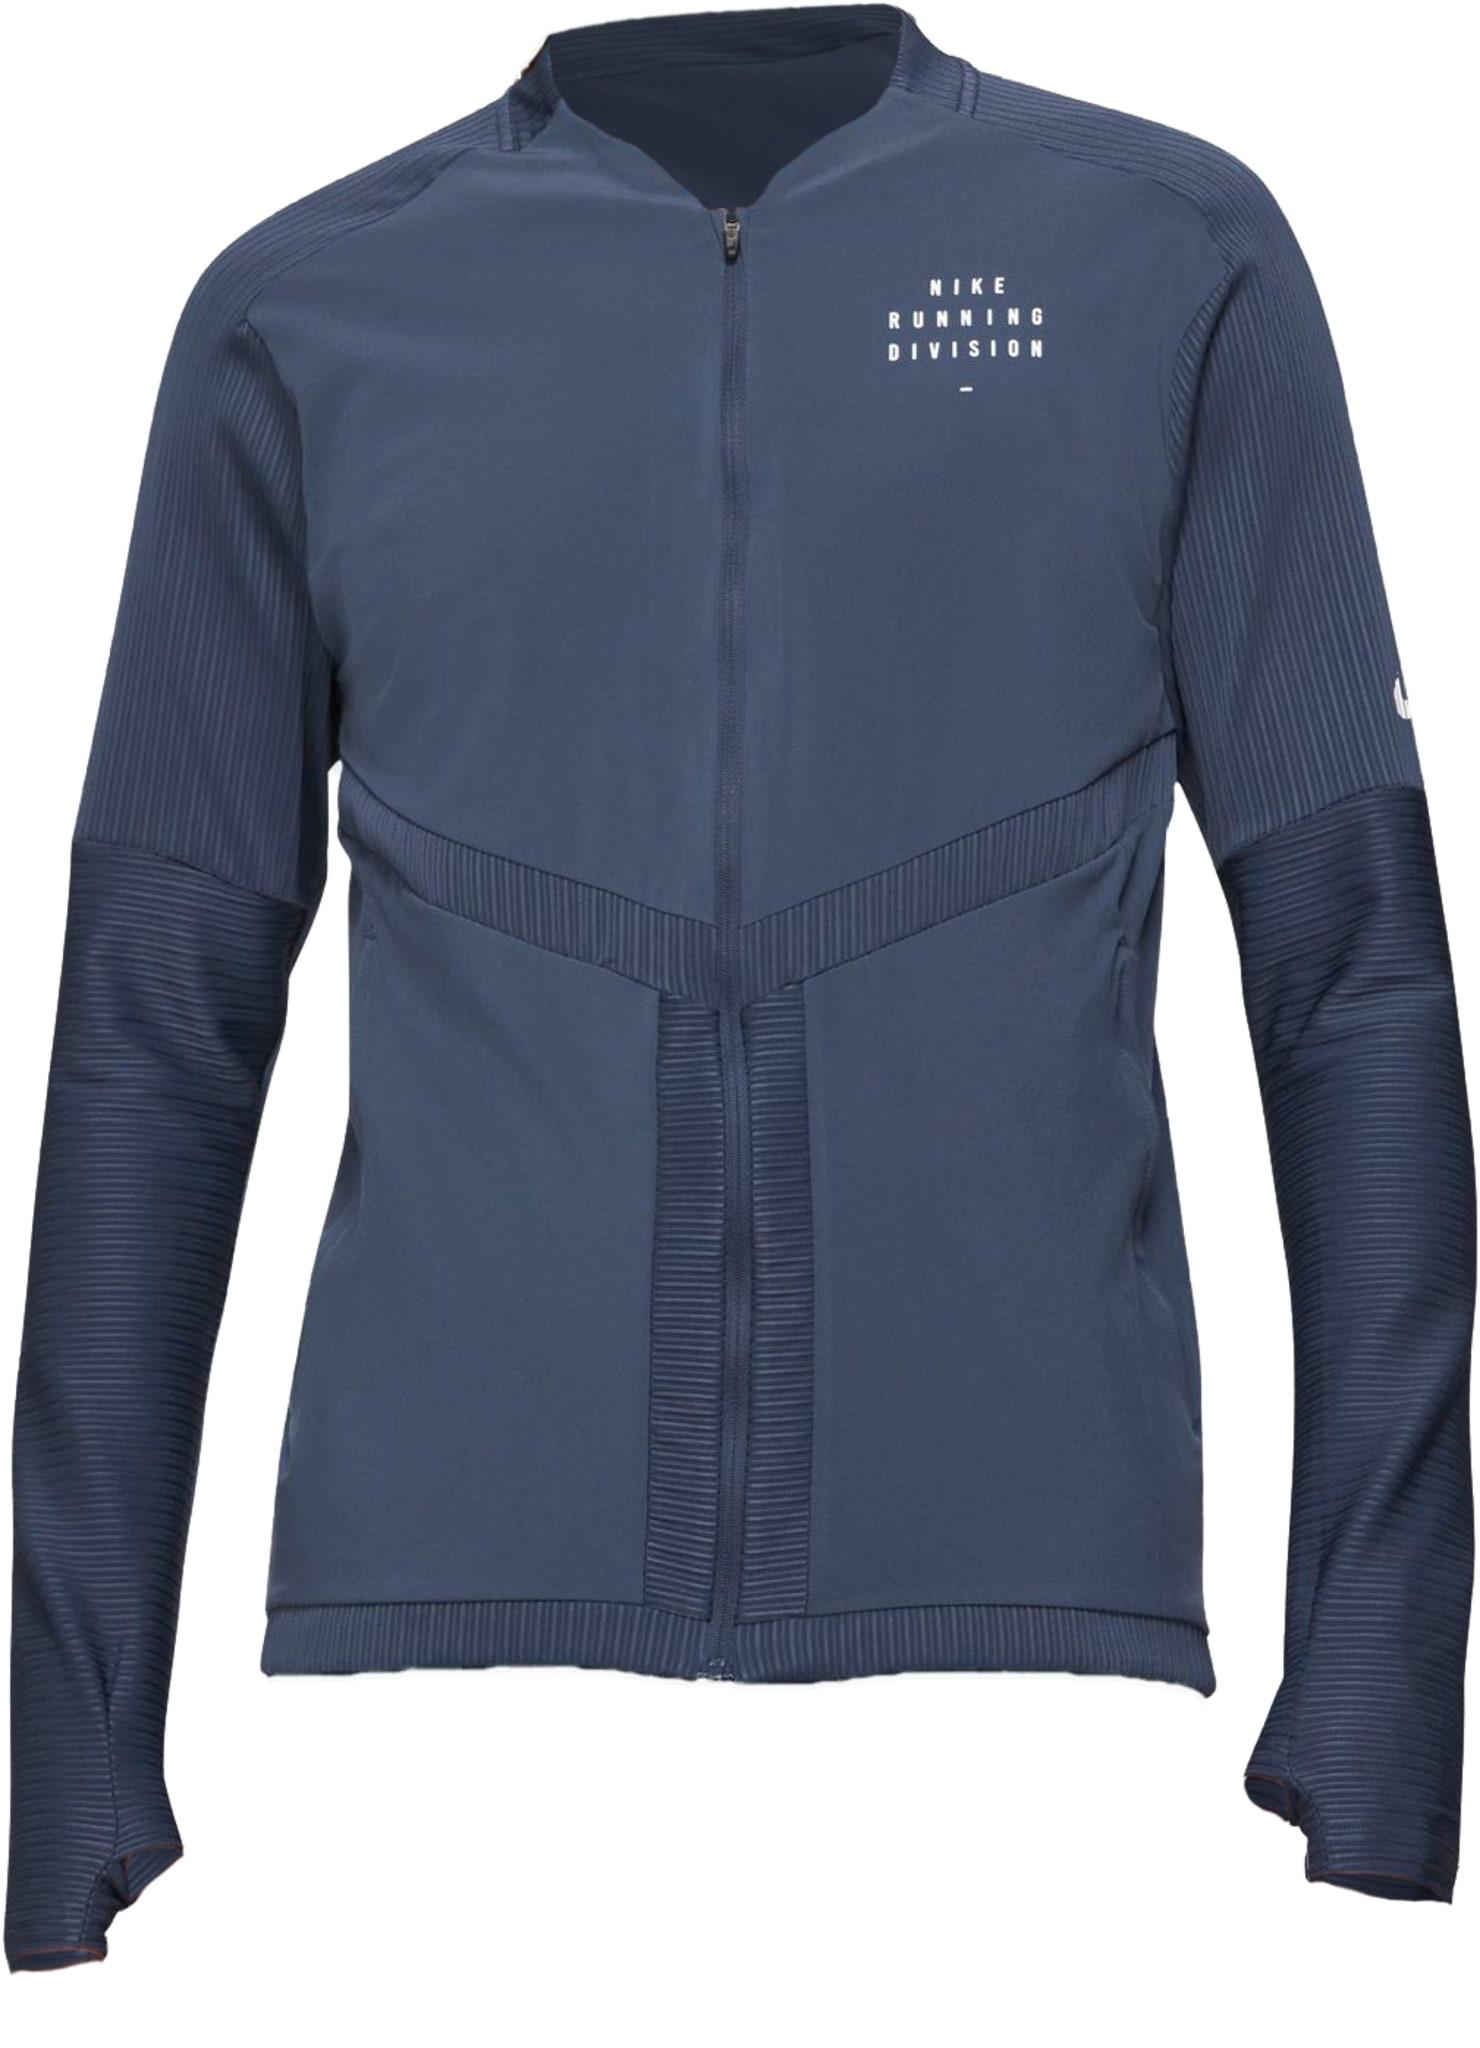 Element Run Division Jacket M